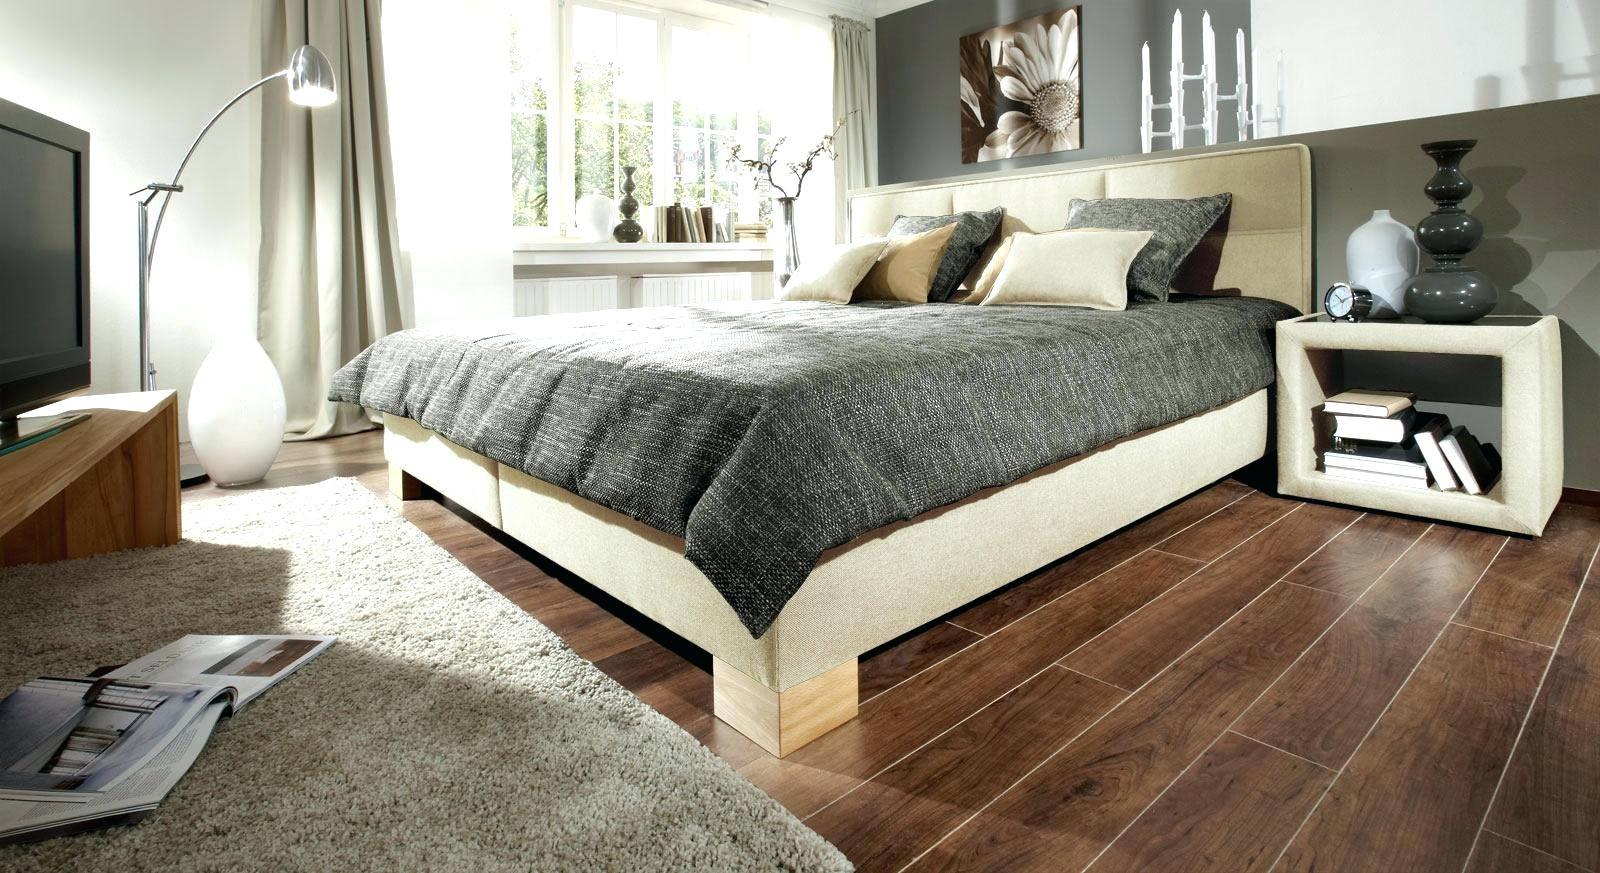 Tagesdecke Bett  Tagesdecke Fur Bett